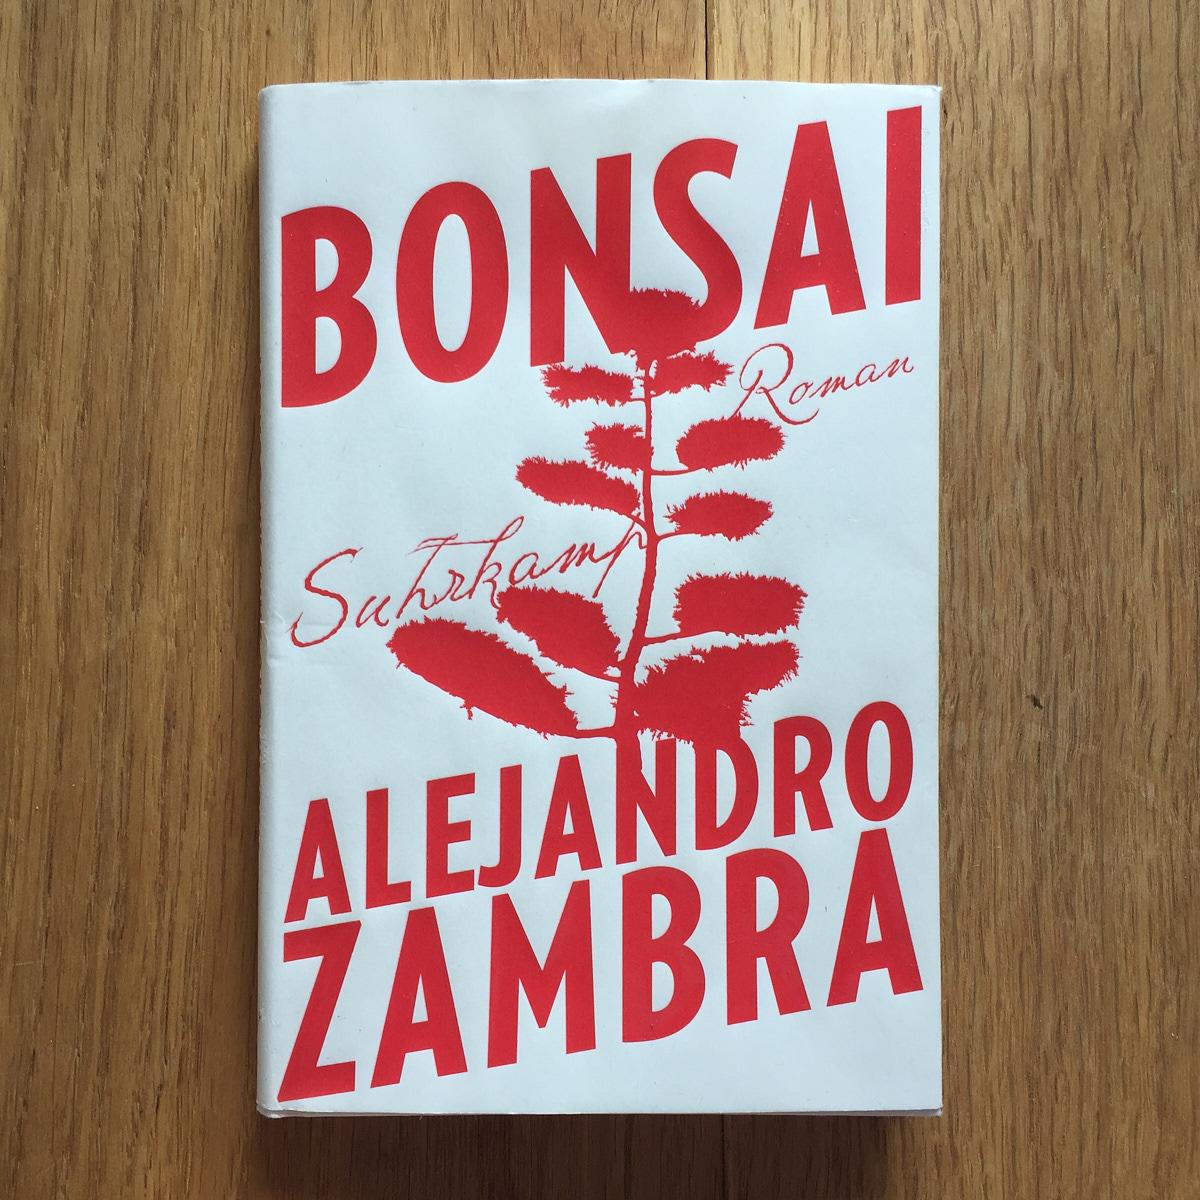 Alejandro Zambra,  Bonsai  (Frankfurt am Main: Suhrkamp, 2015)    Buch der Woche vom 24.06.2018